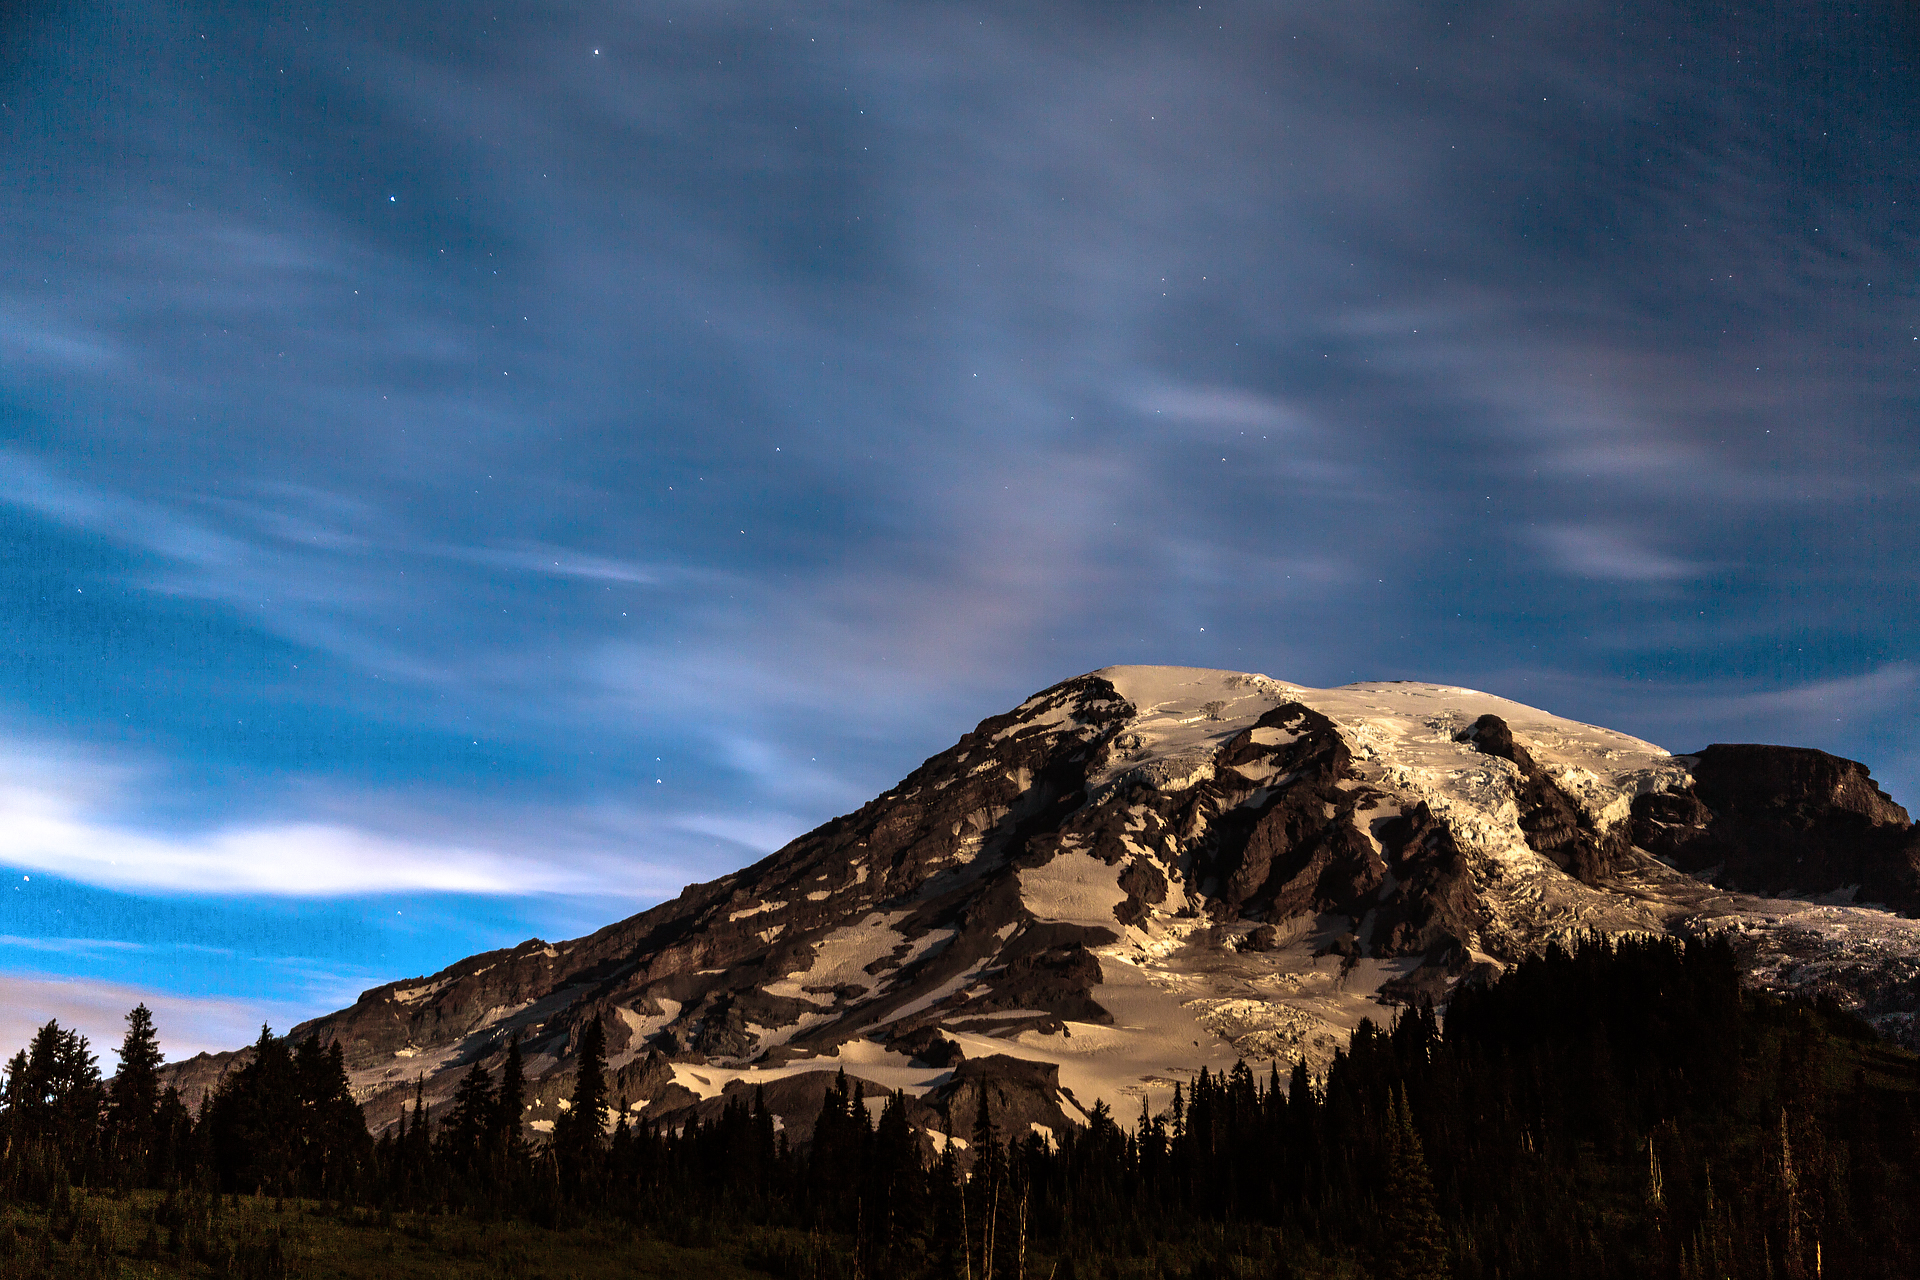 20130821-Mount-Rainier-Day-1-277.jpg